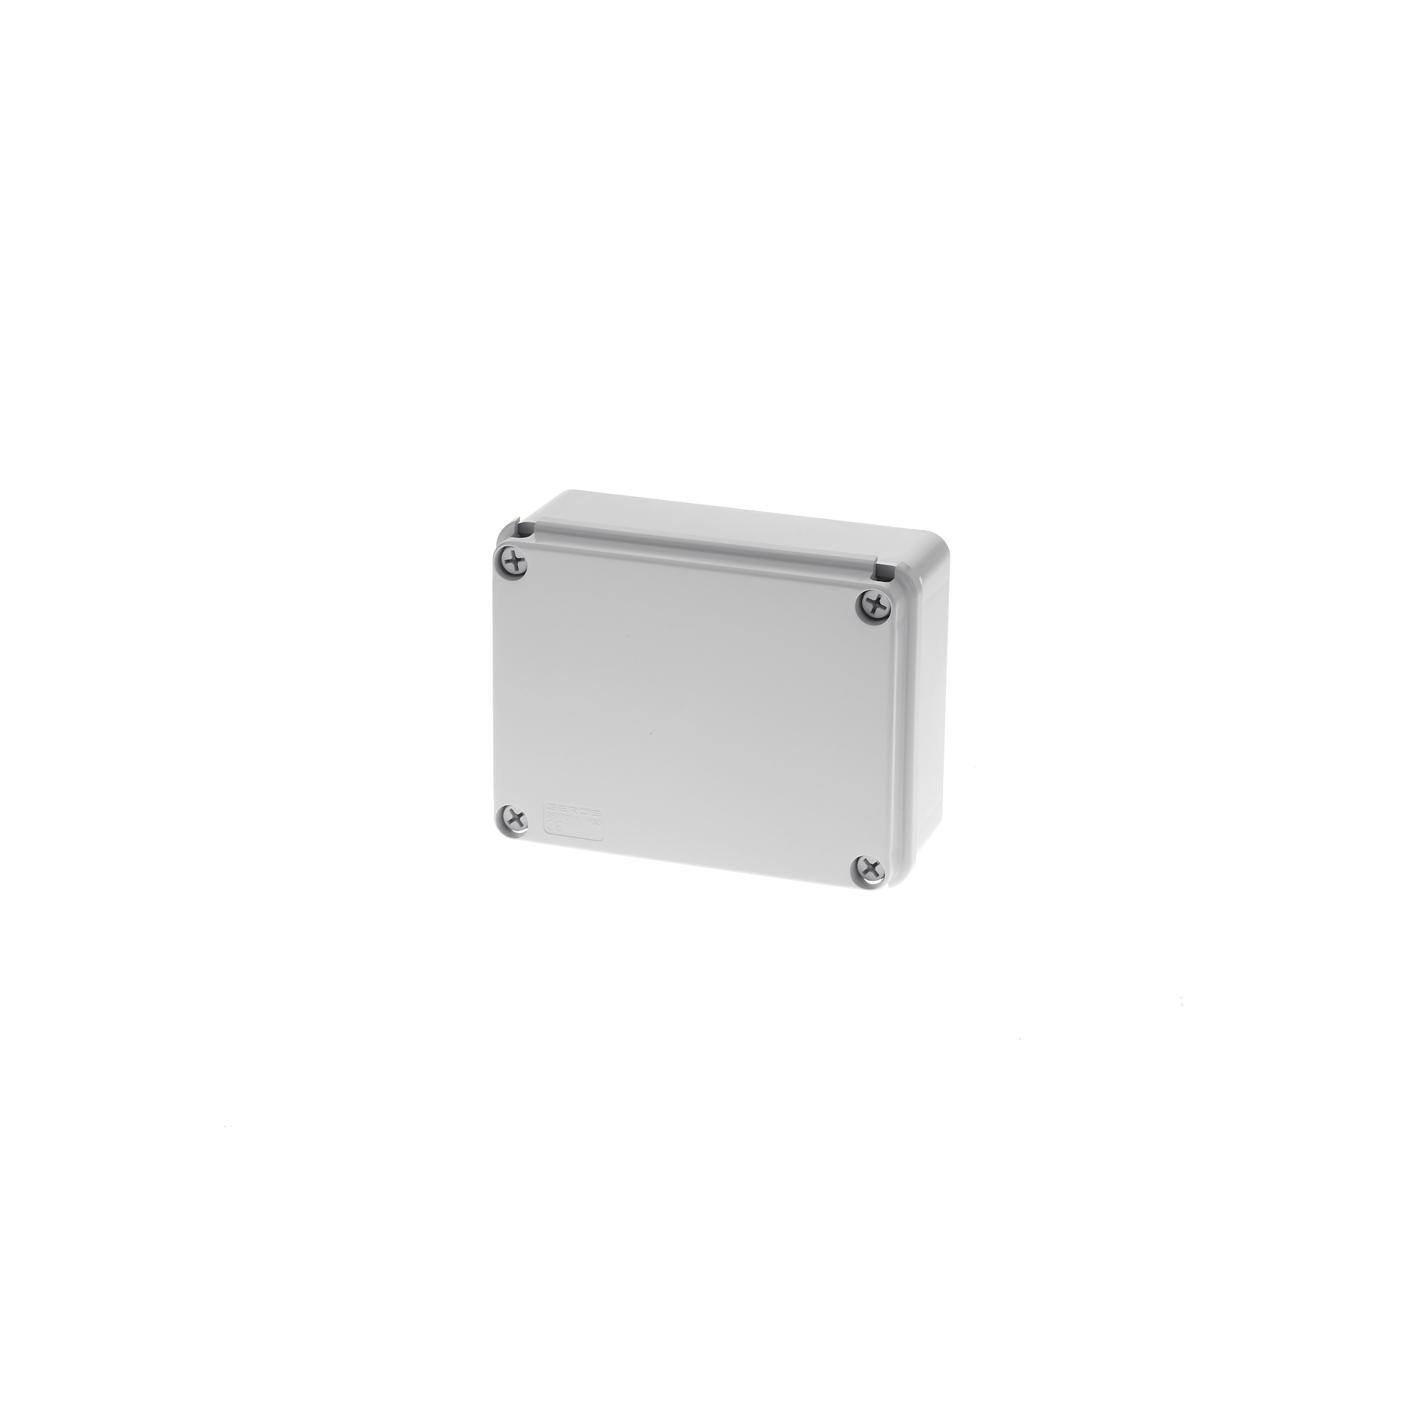 Pinta-asennuskotelo IP55 190x140x75